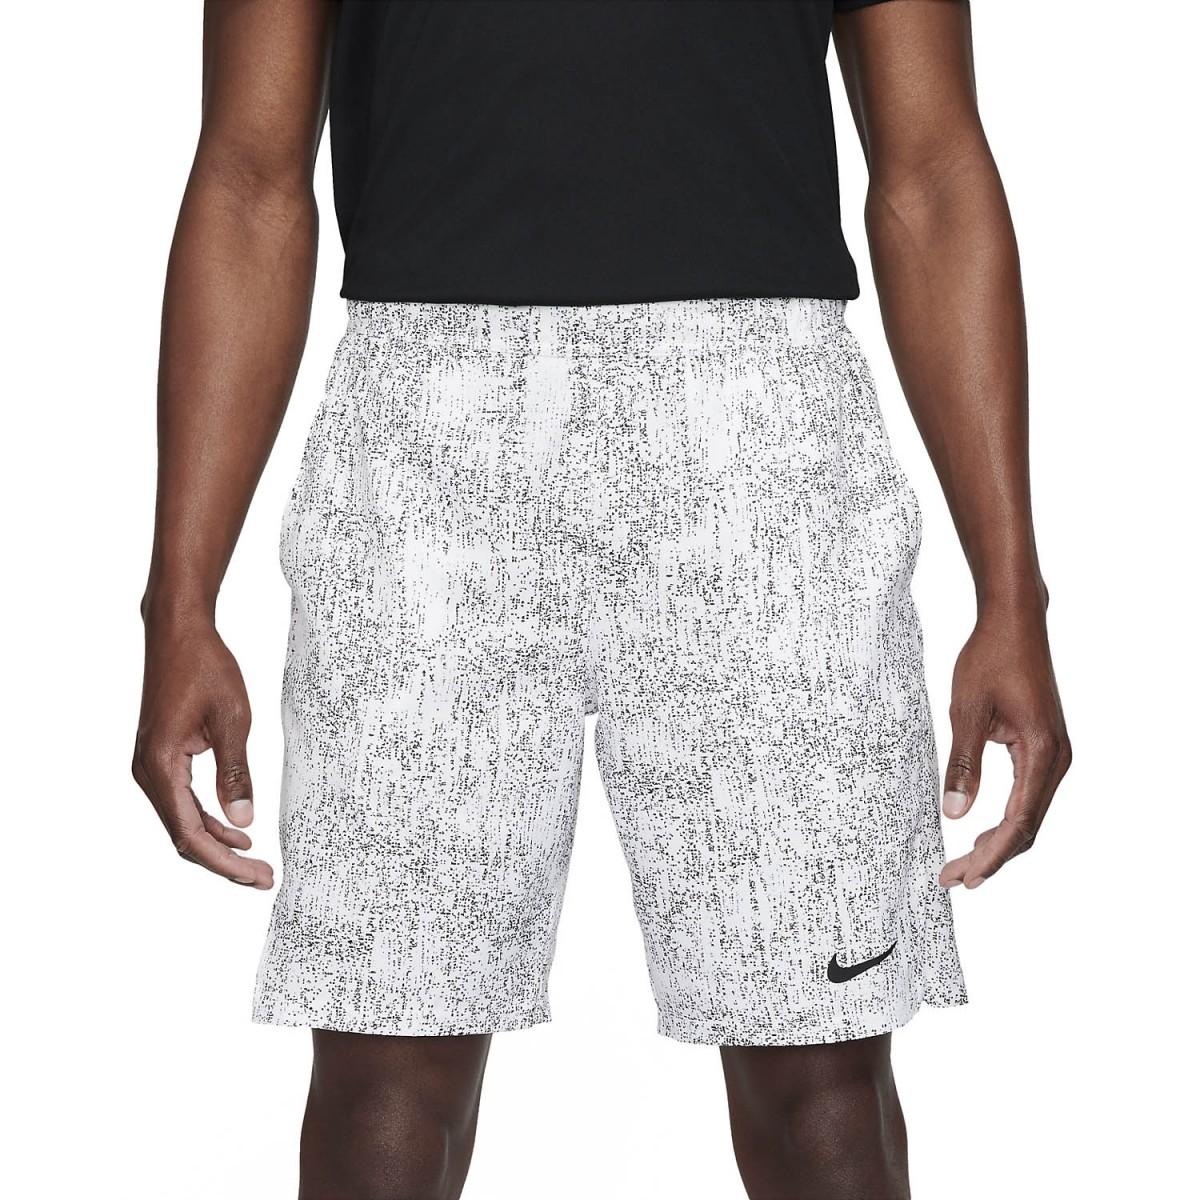 Теннисные шорты мужские Nike Court Flex Victory Short 9in Printed white/black